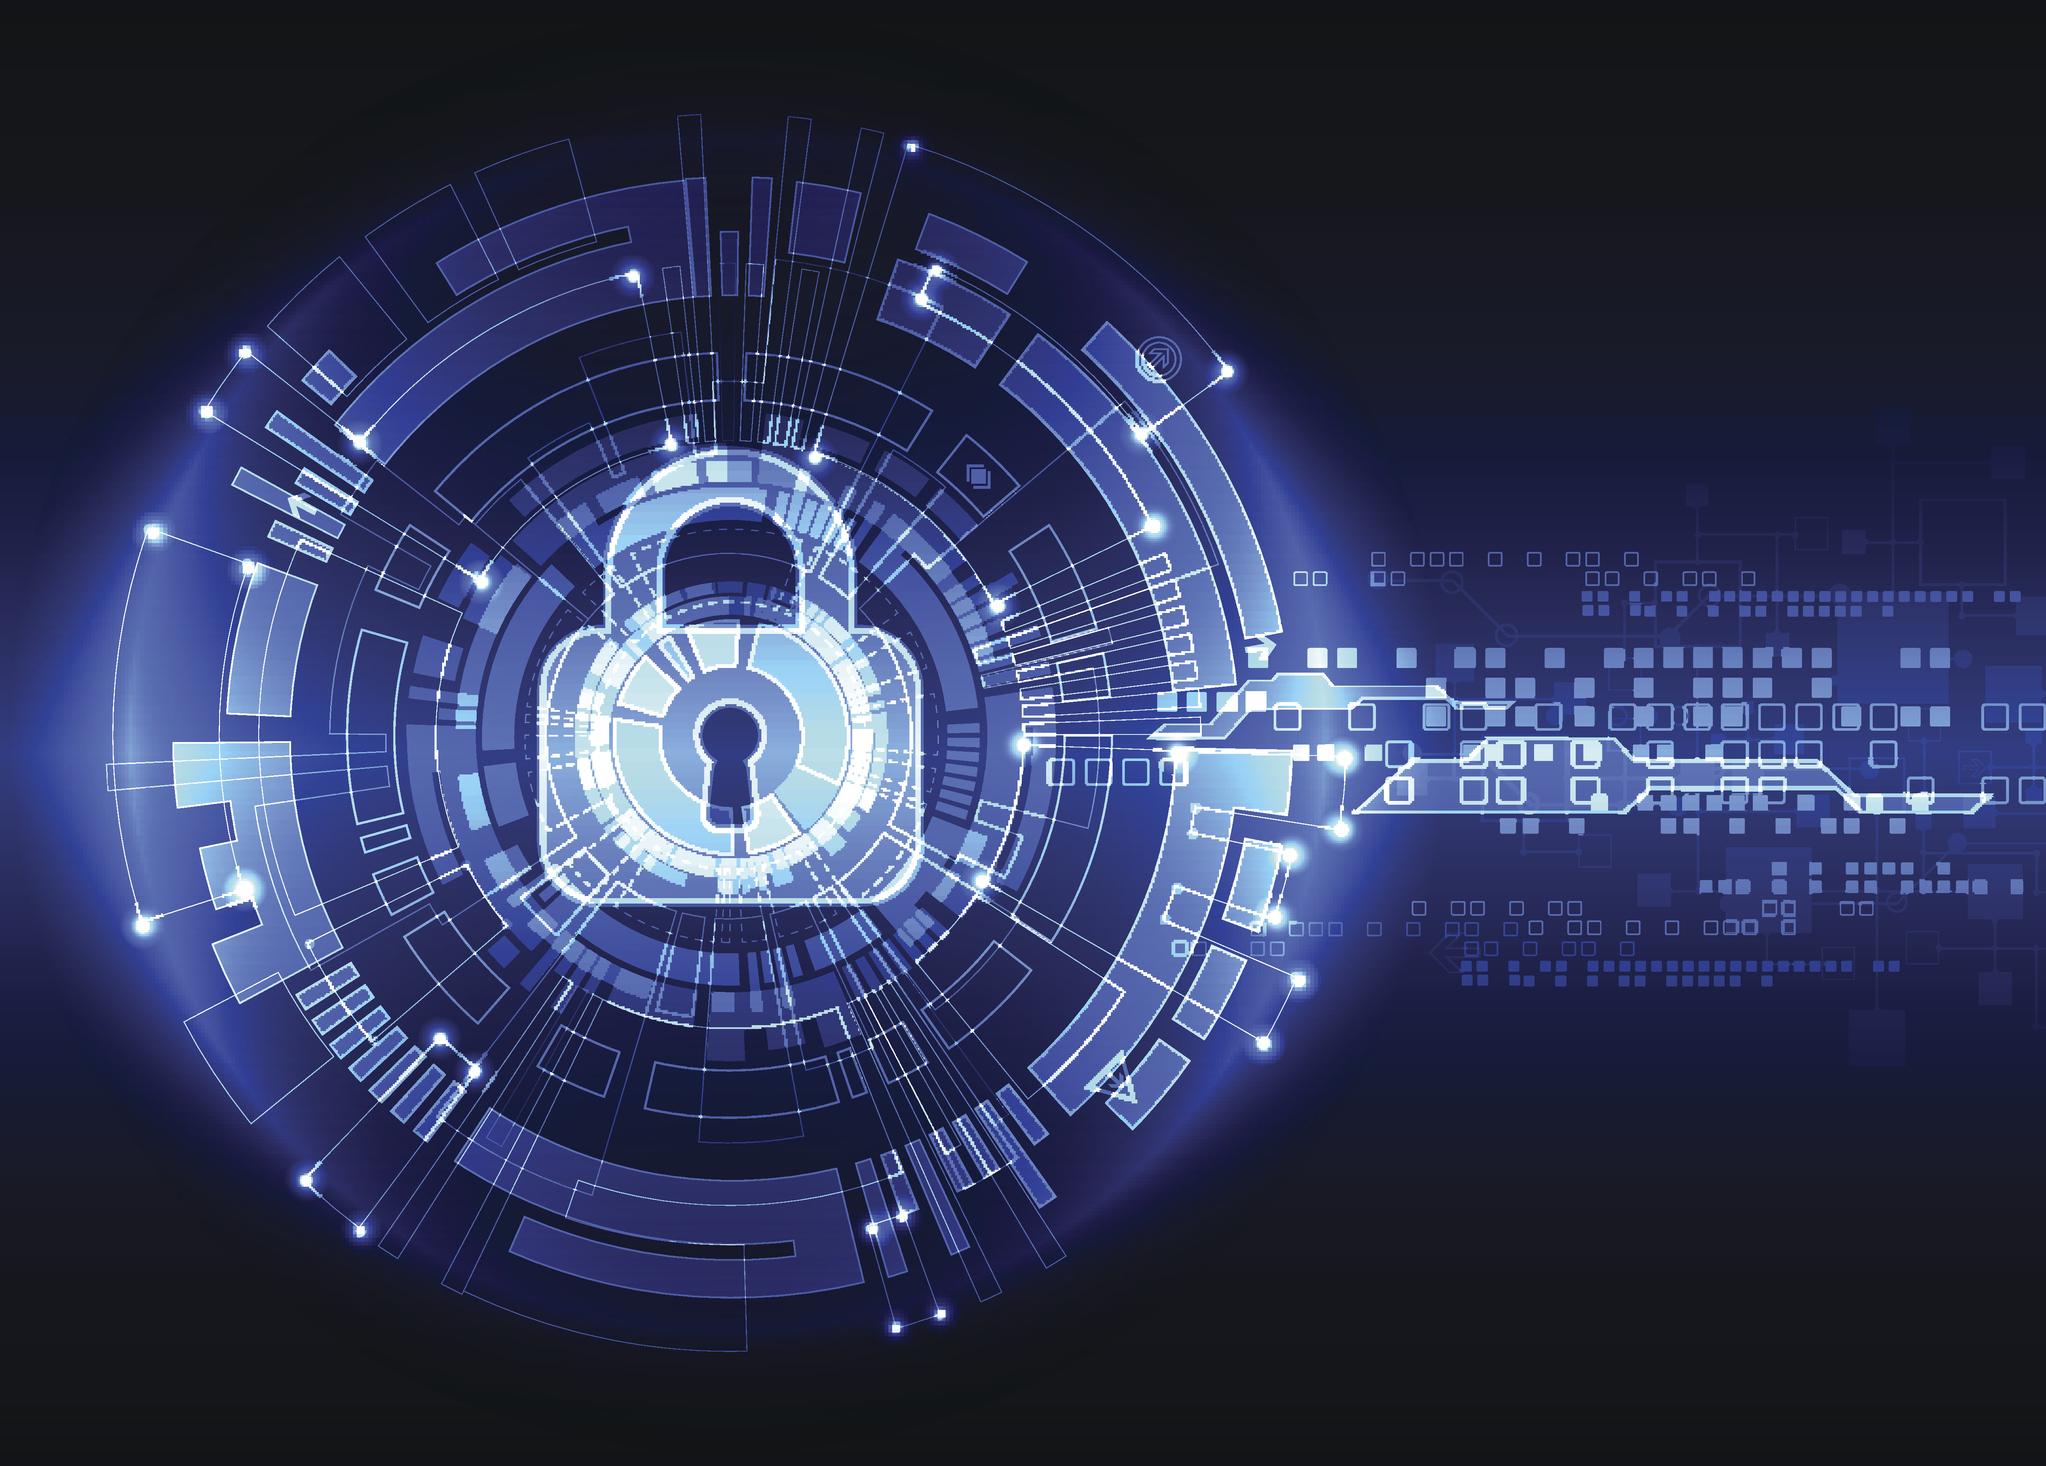 A digital image of a locked padlock.